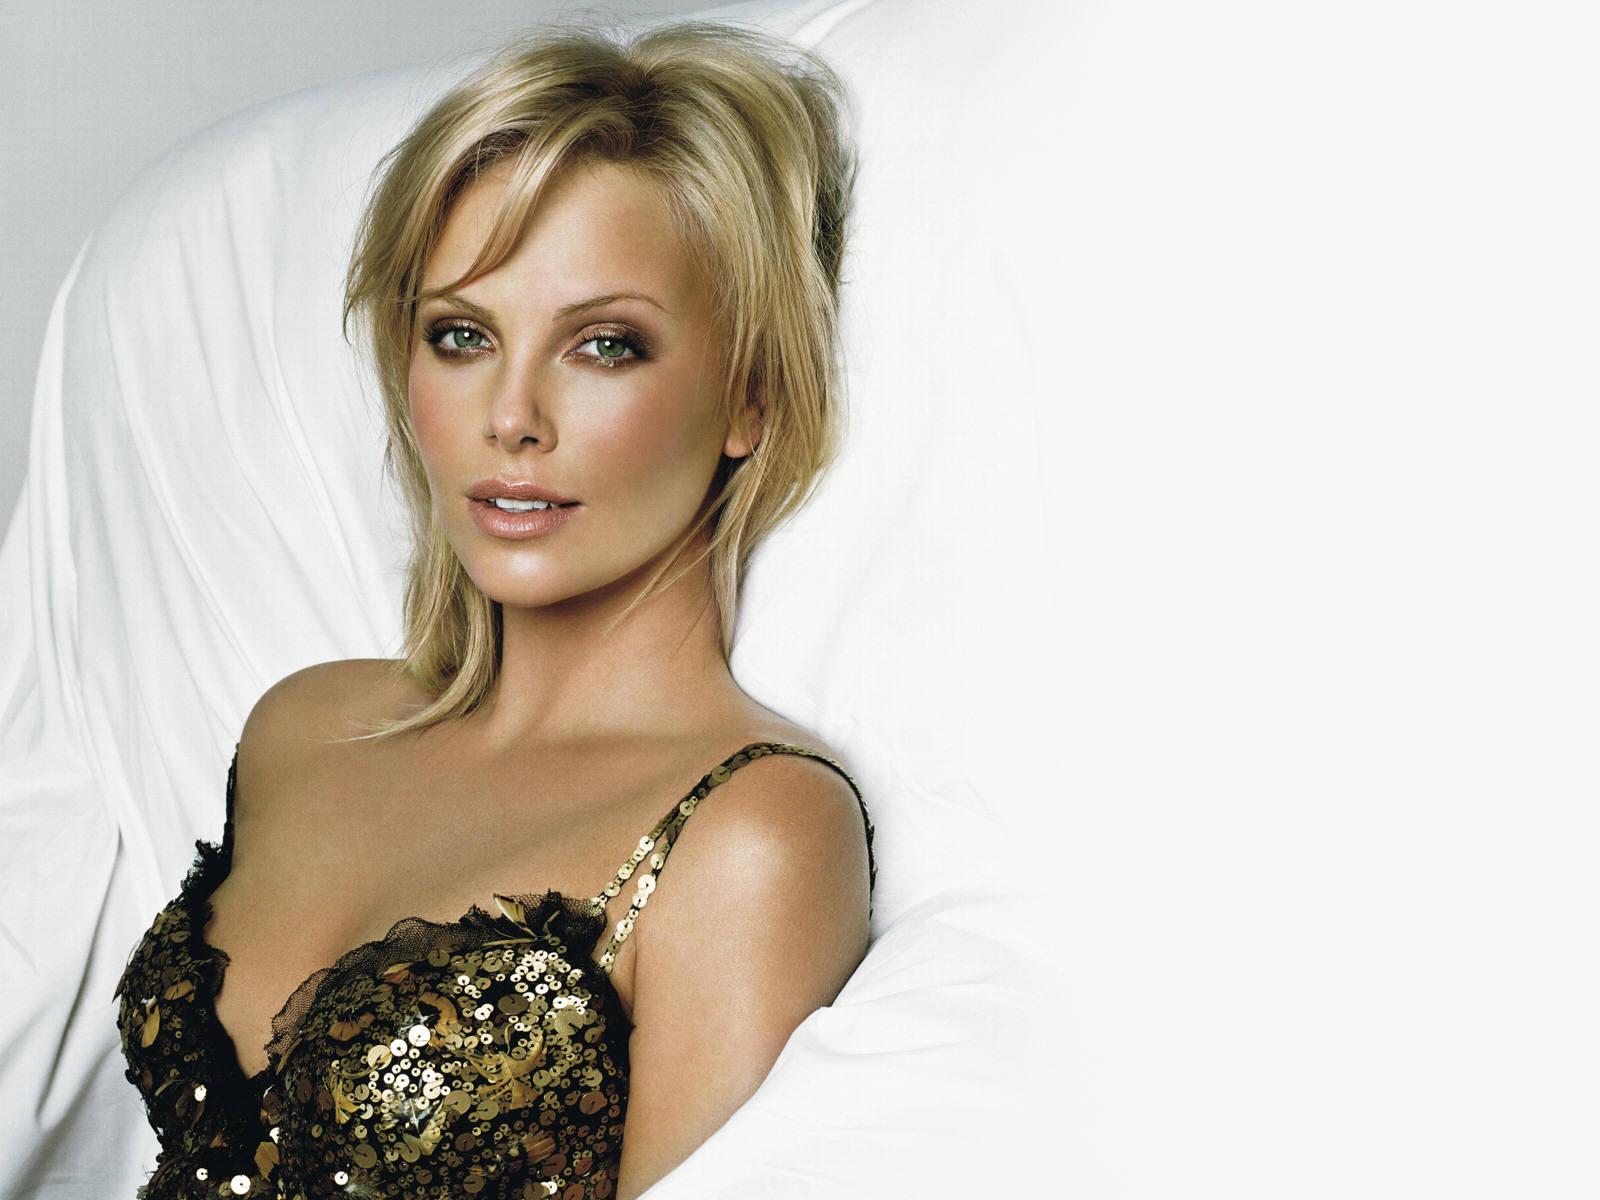 http://www.zastavki.com/pictures/1600x1200/2008/Girls_Models_Models_C_Charlize_Theron_004881_.jpg